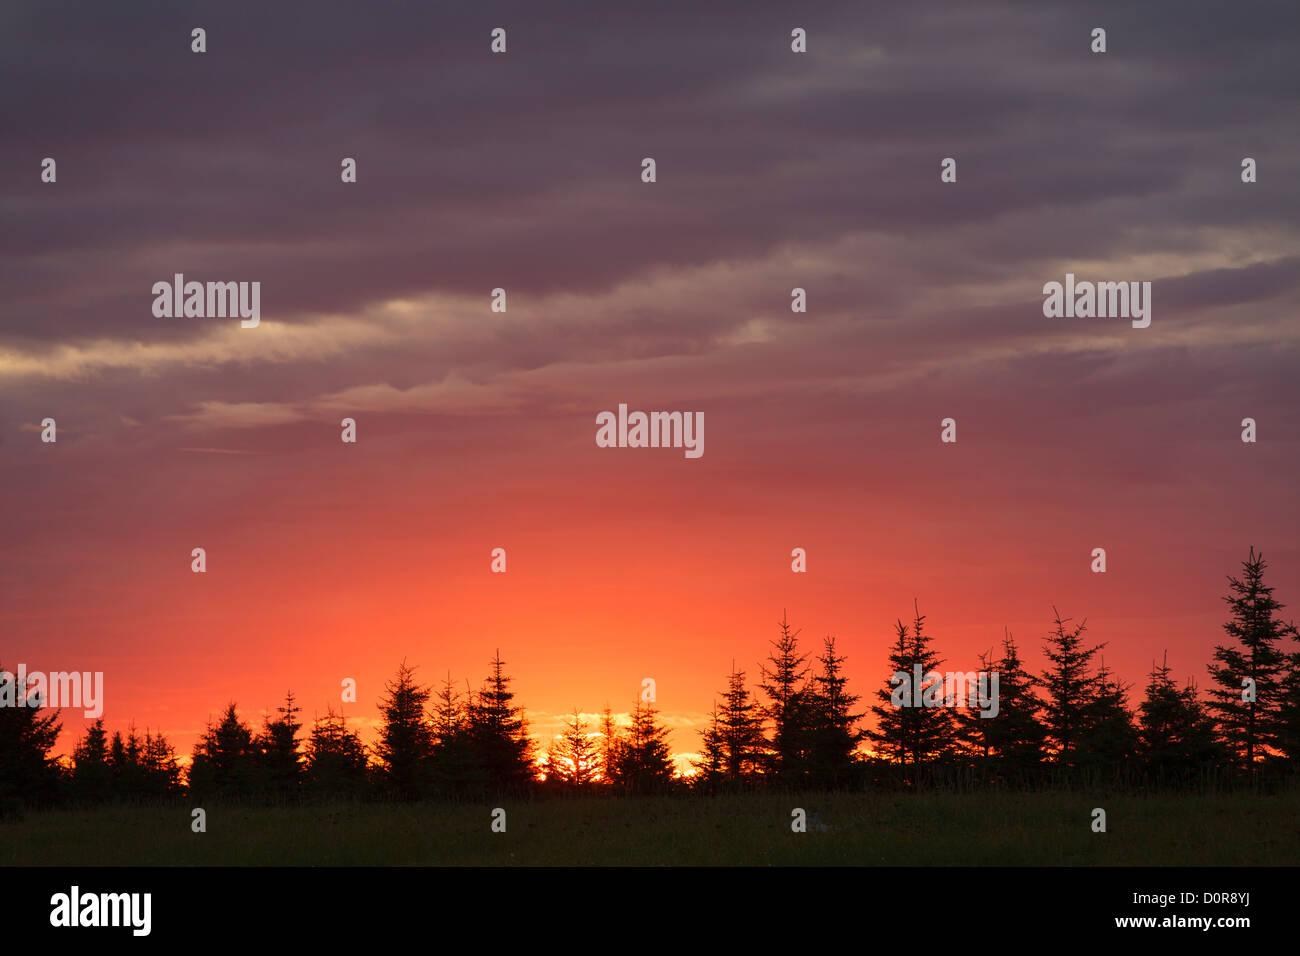 Sunrise at Lake Clark National Park, Alaska. - Stock Image